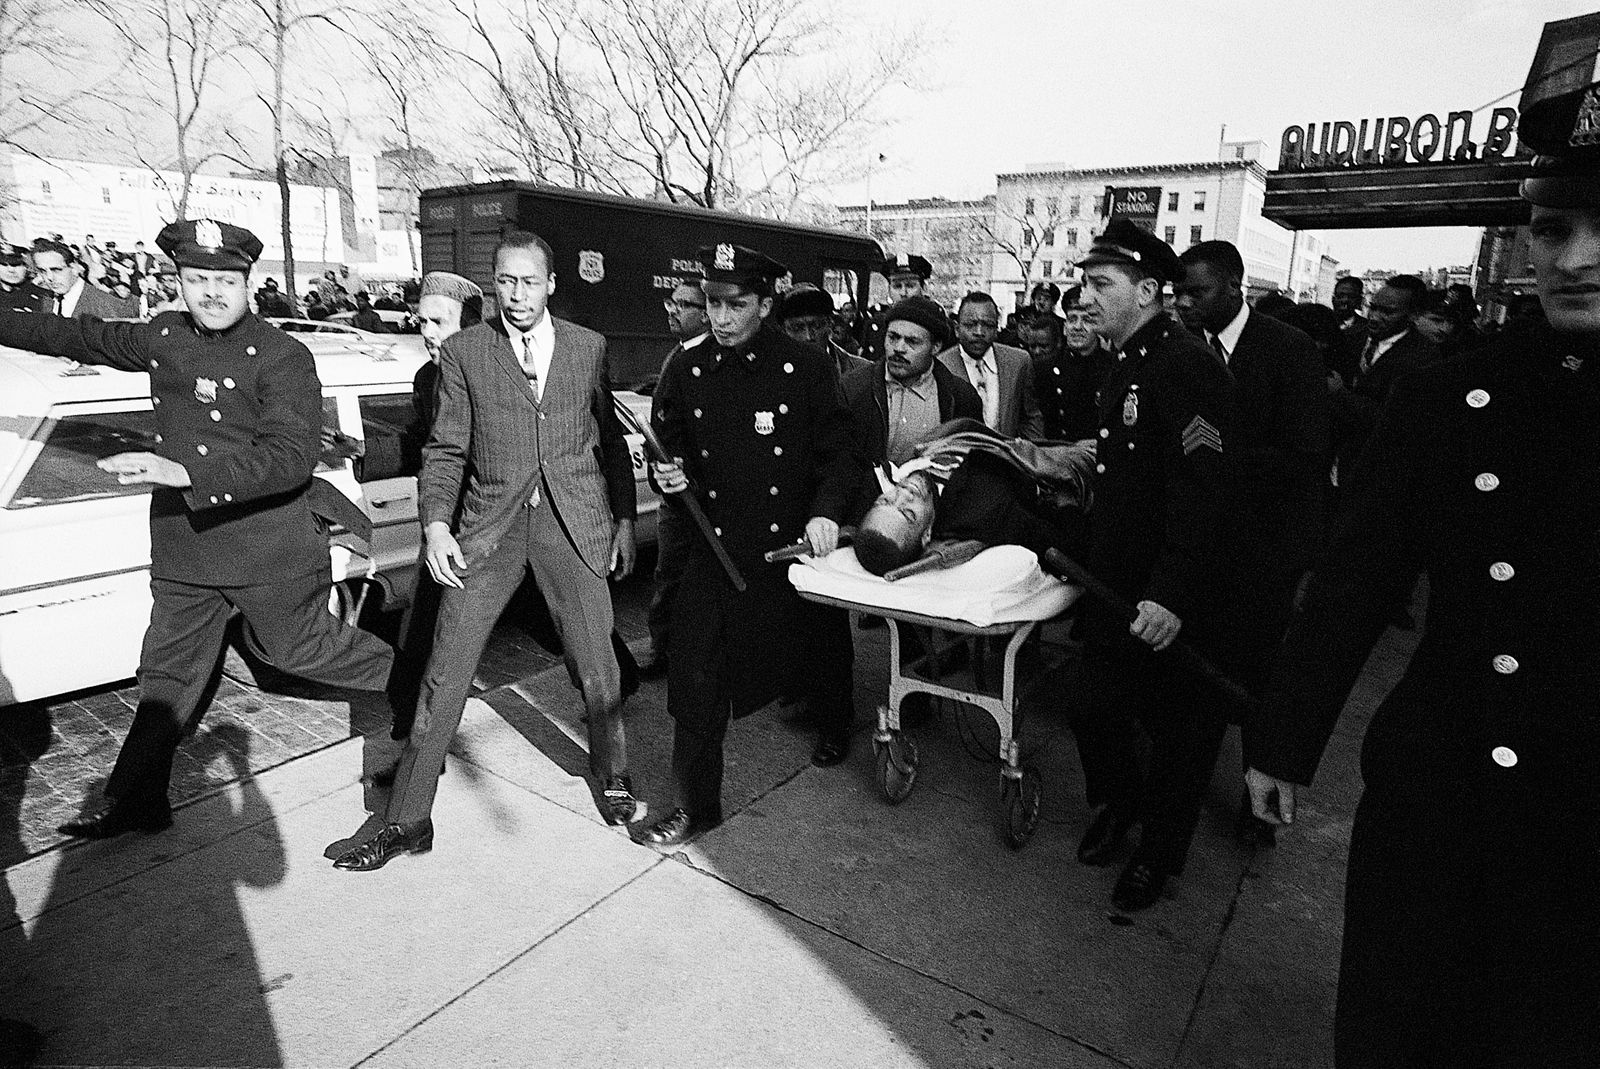 Police Carry Stretcher with Malcolm X's Body